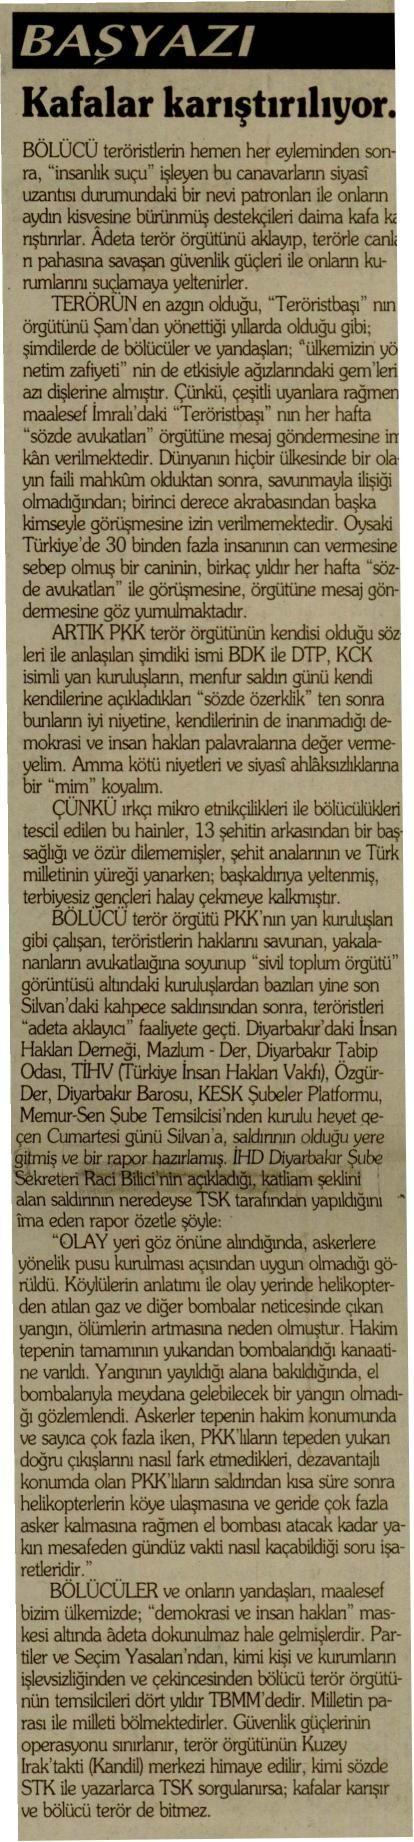 istanbul_20110719_7.jpg